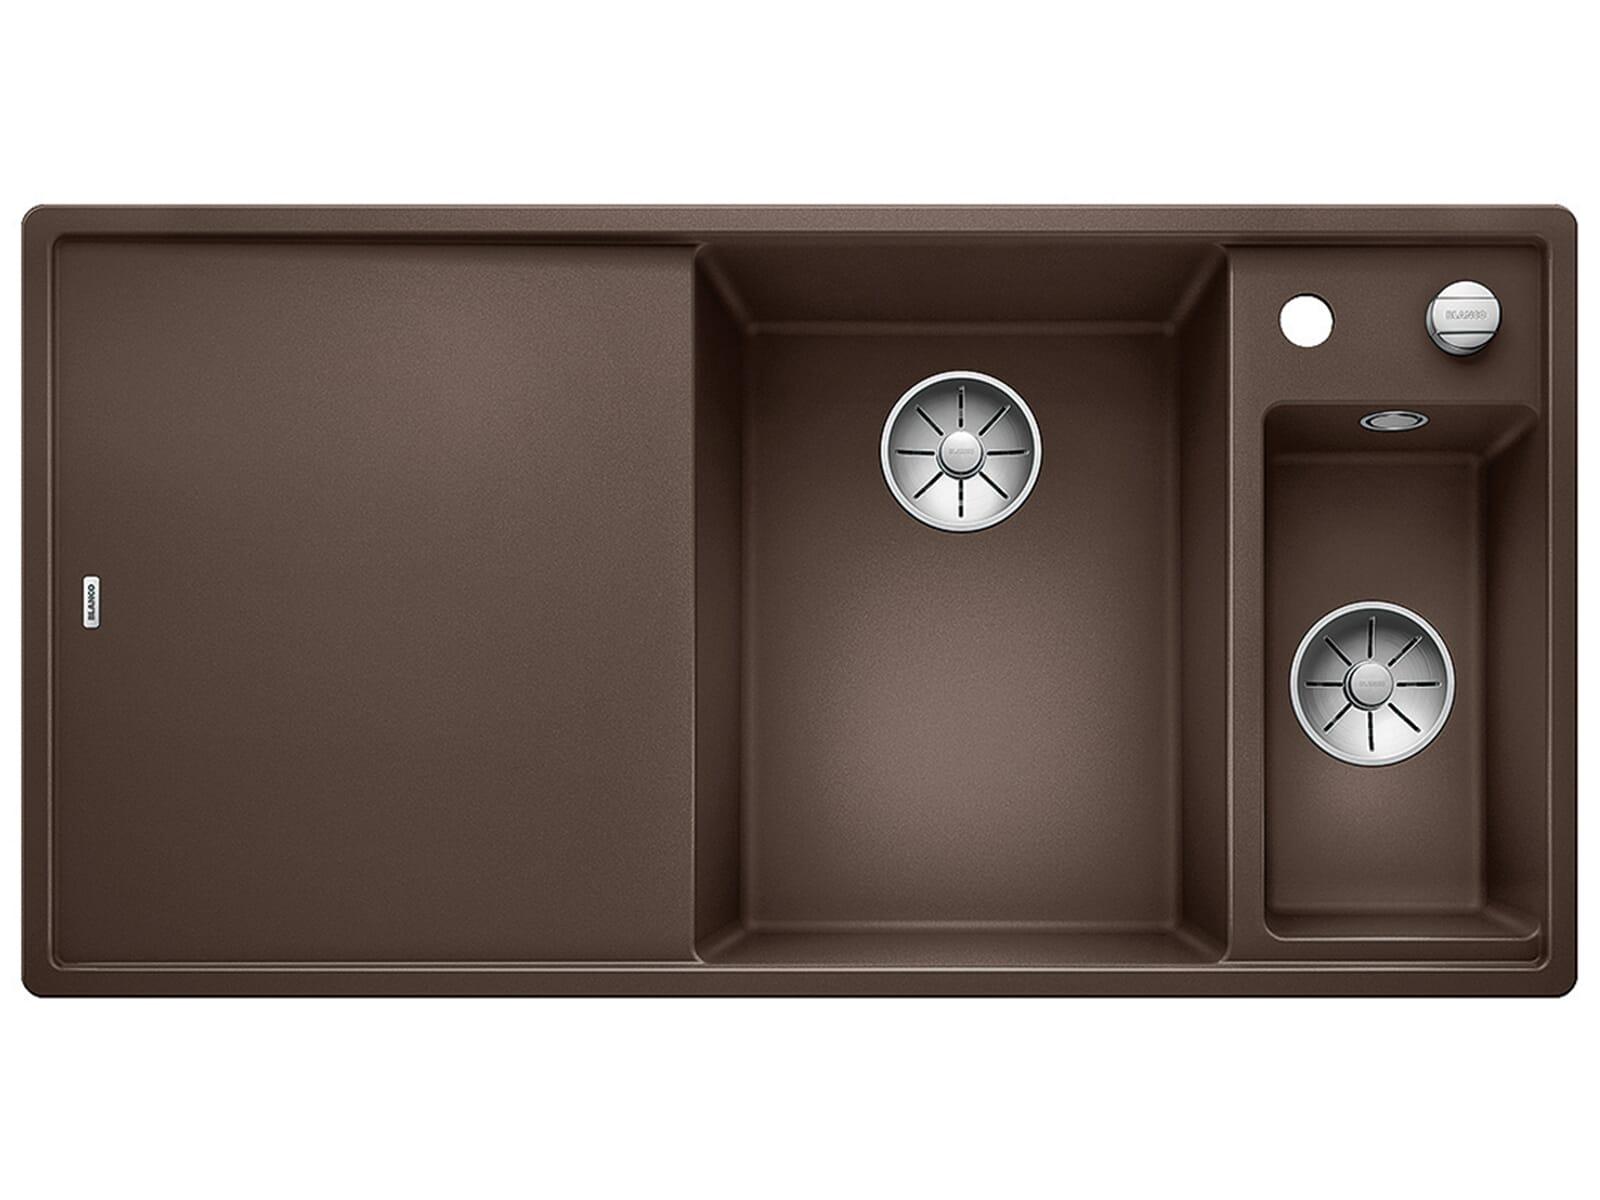 Blanco Axia III 6 S-F Cafe - 523 494 Granitspüle